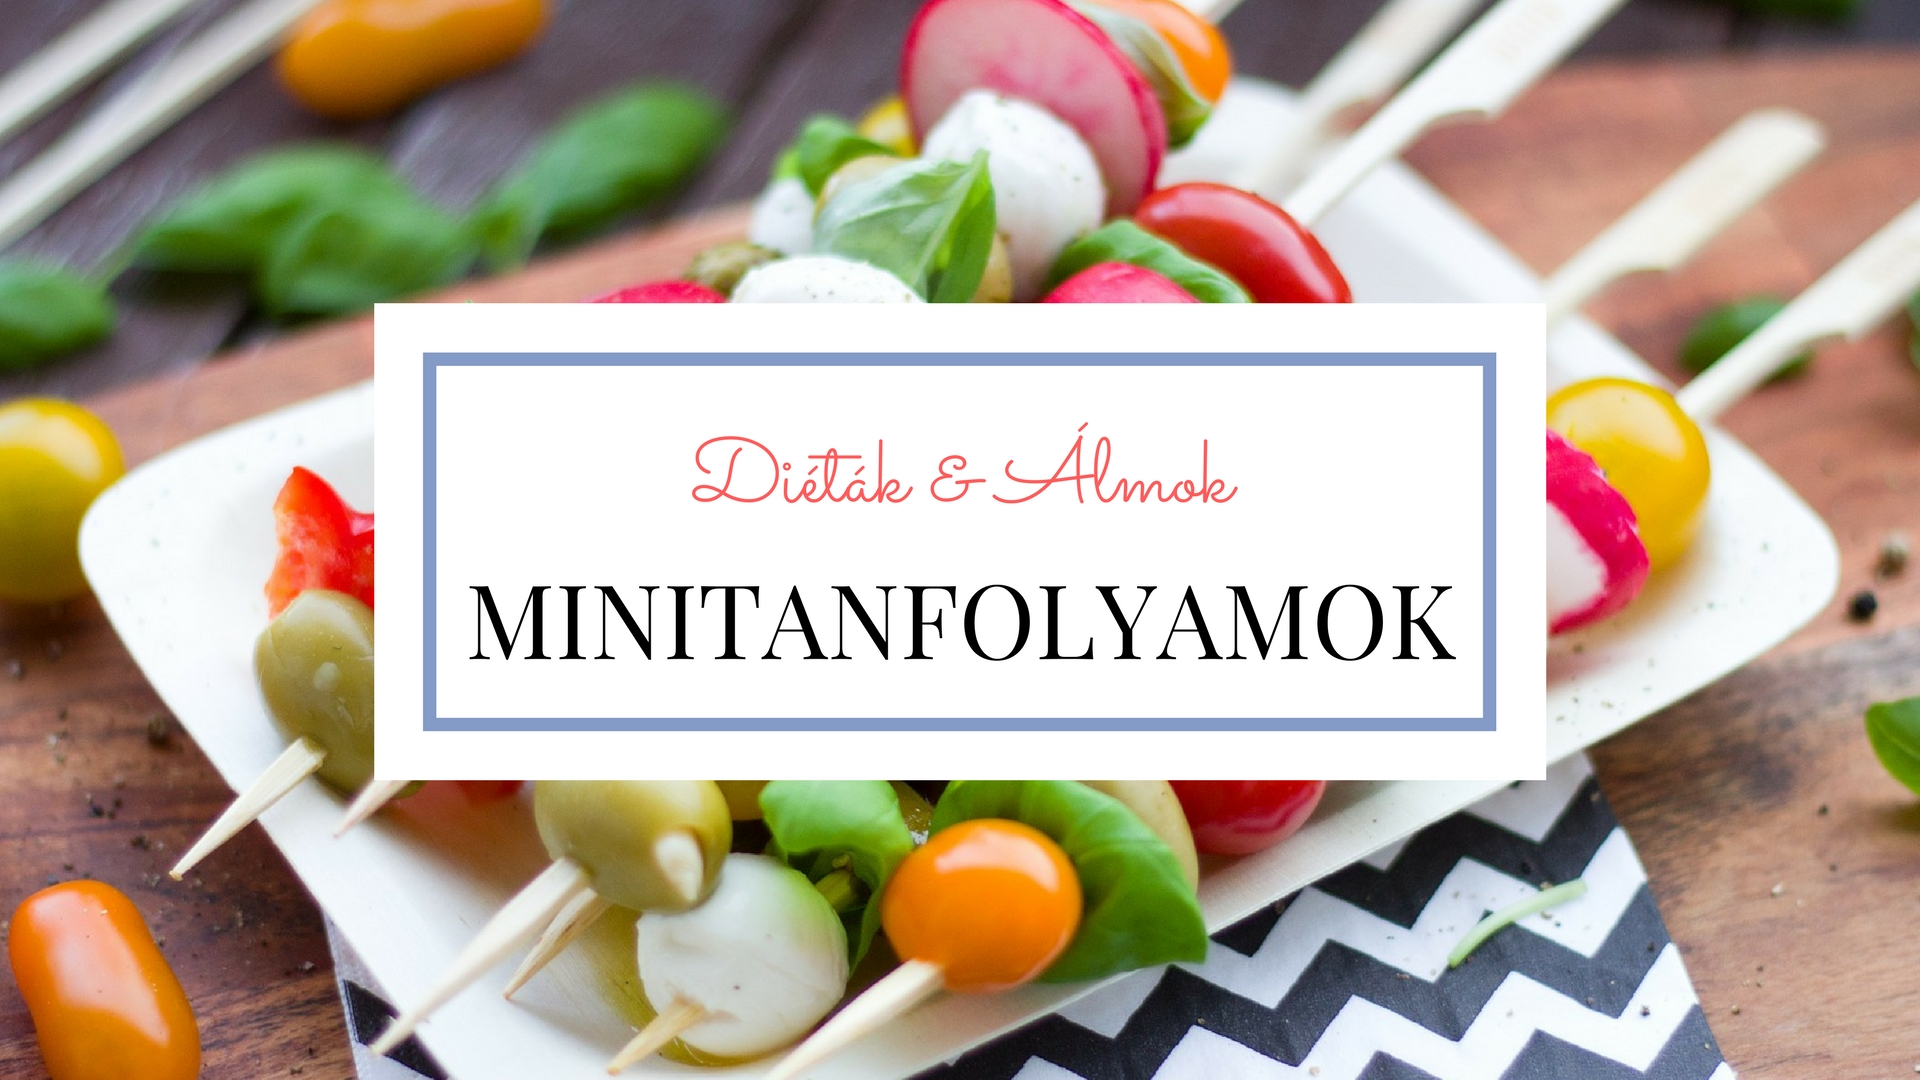 dietak_almok_minitanfolyamok.jpg